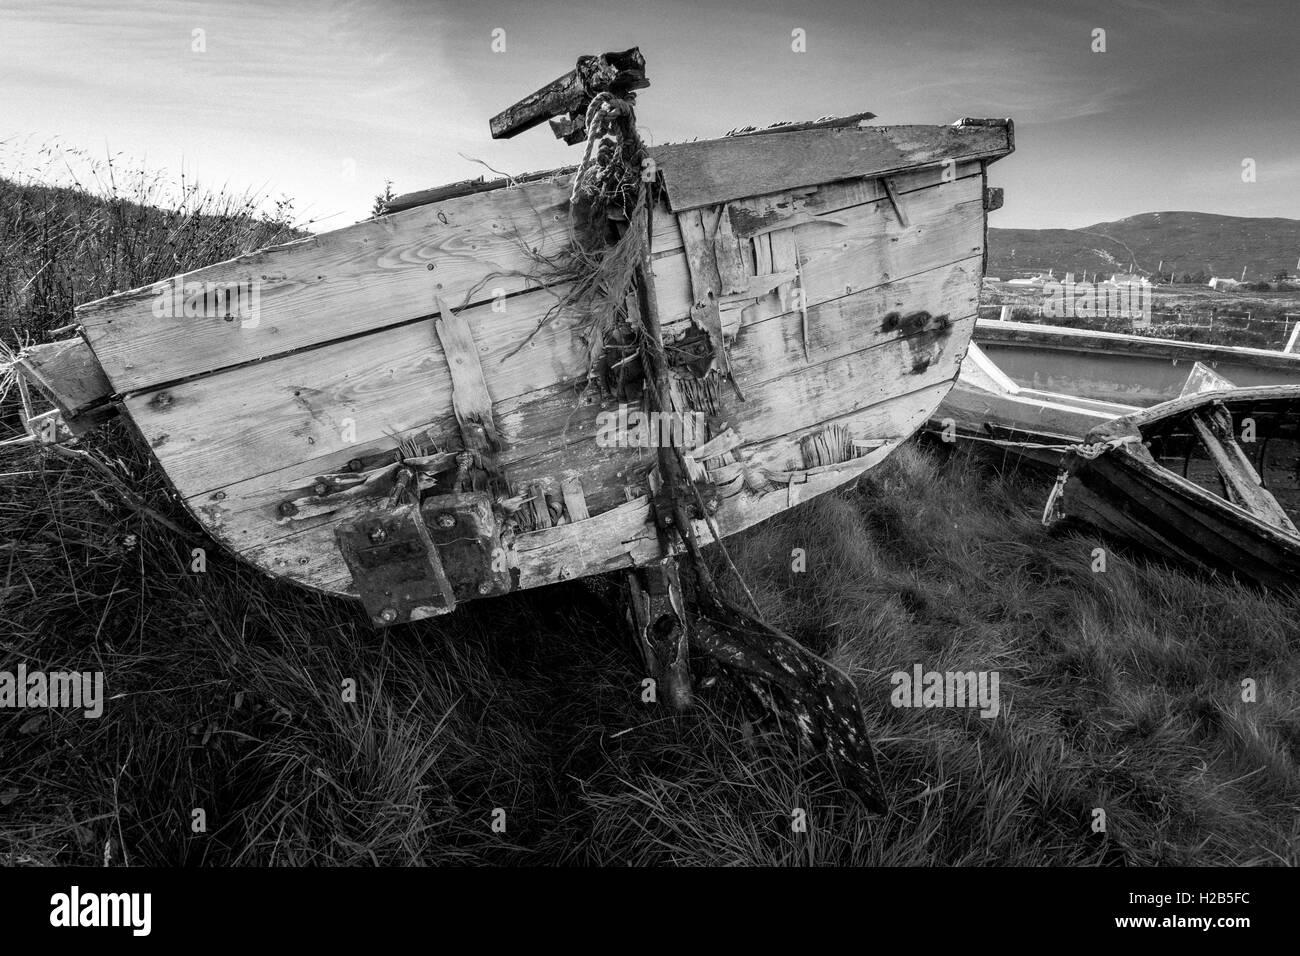 Isle of Lewis, Outer Hebrides, Scotland Abandoned boat near Loch Erisort - Stock Image